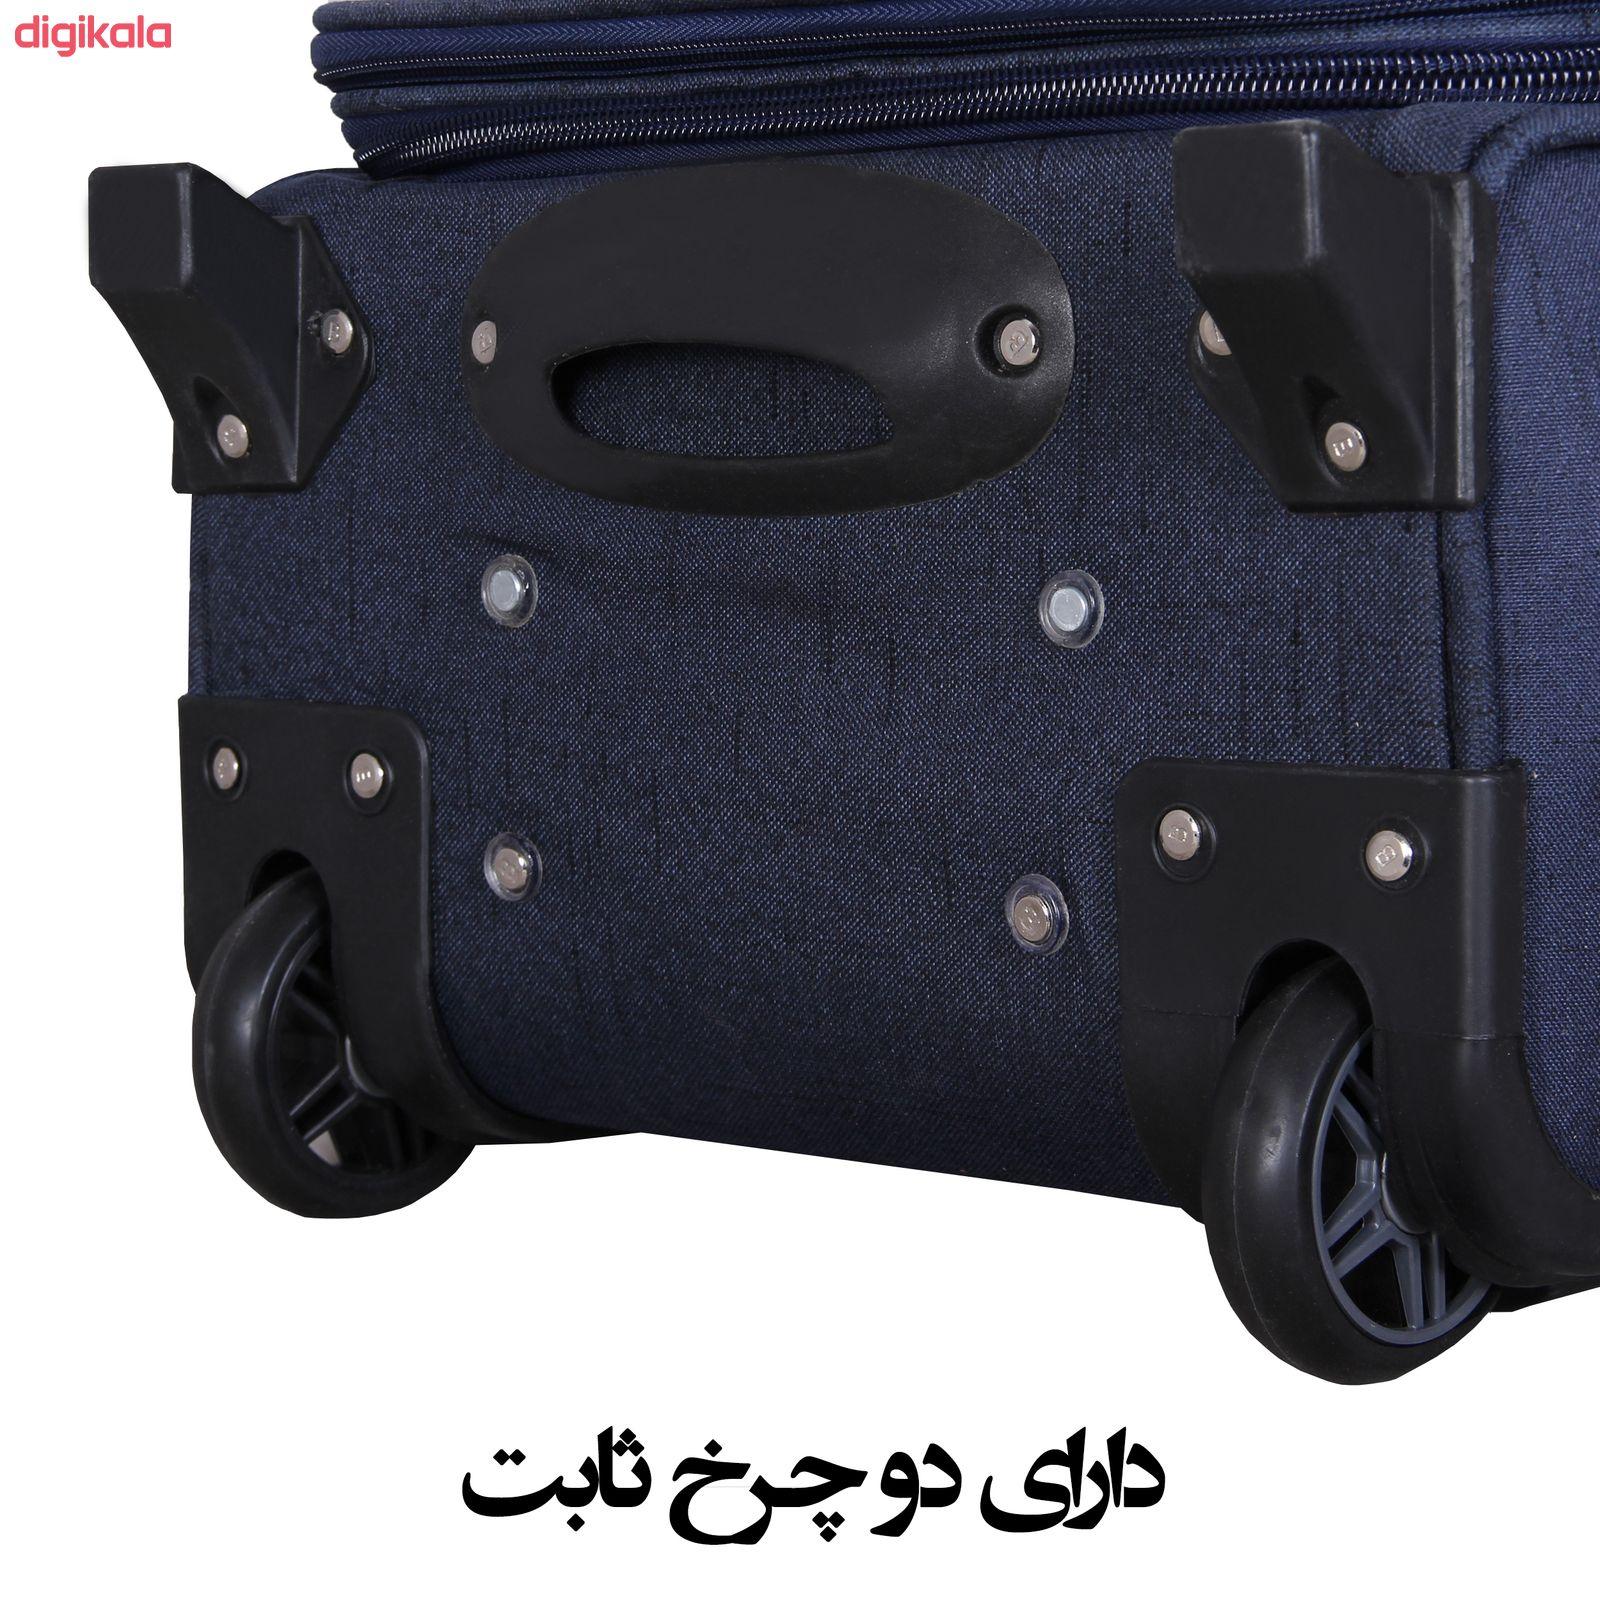 مجموعه سه عددی چمدان کد 2301A main 1 9